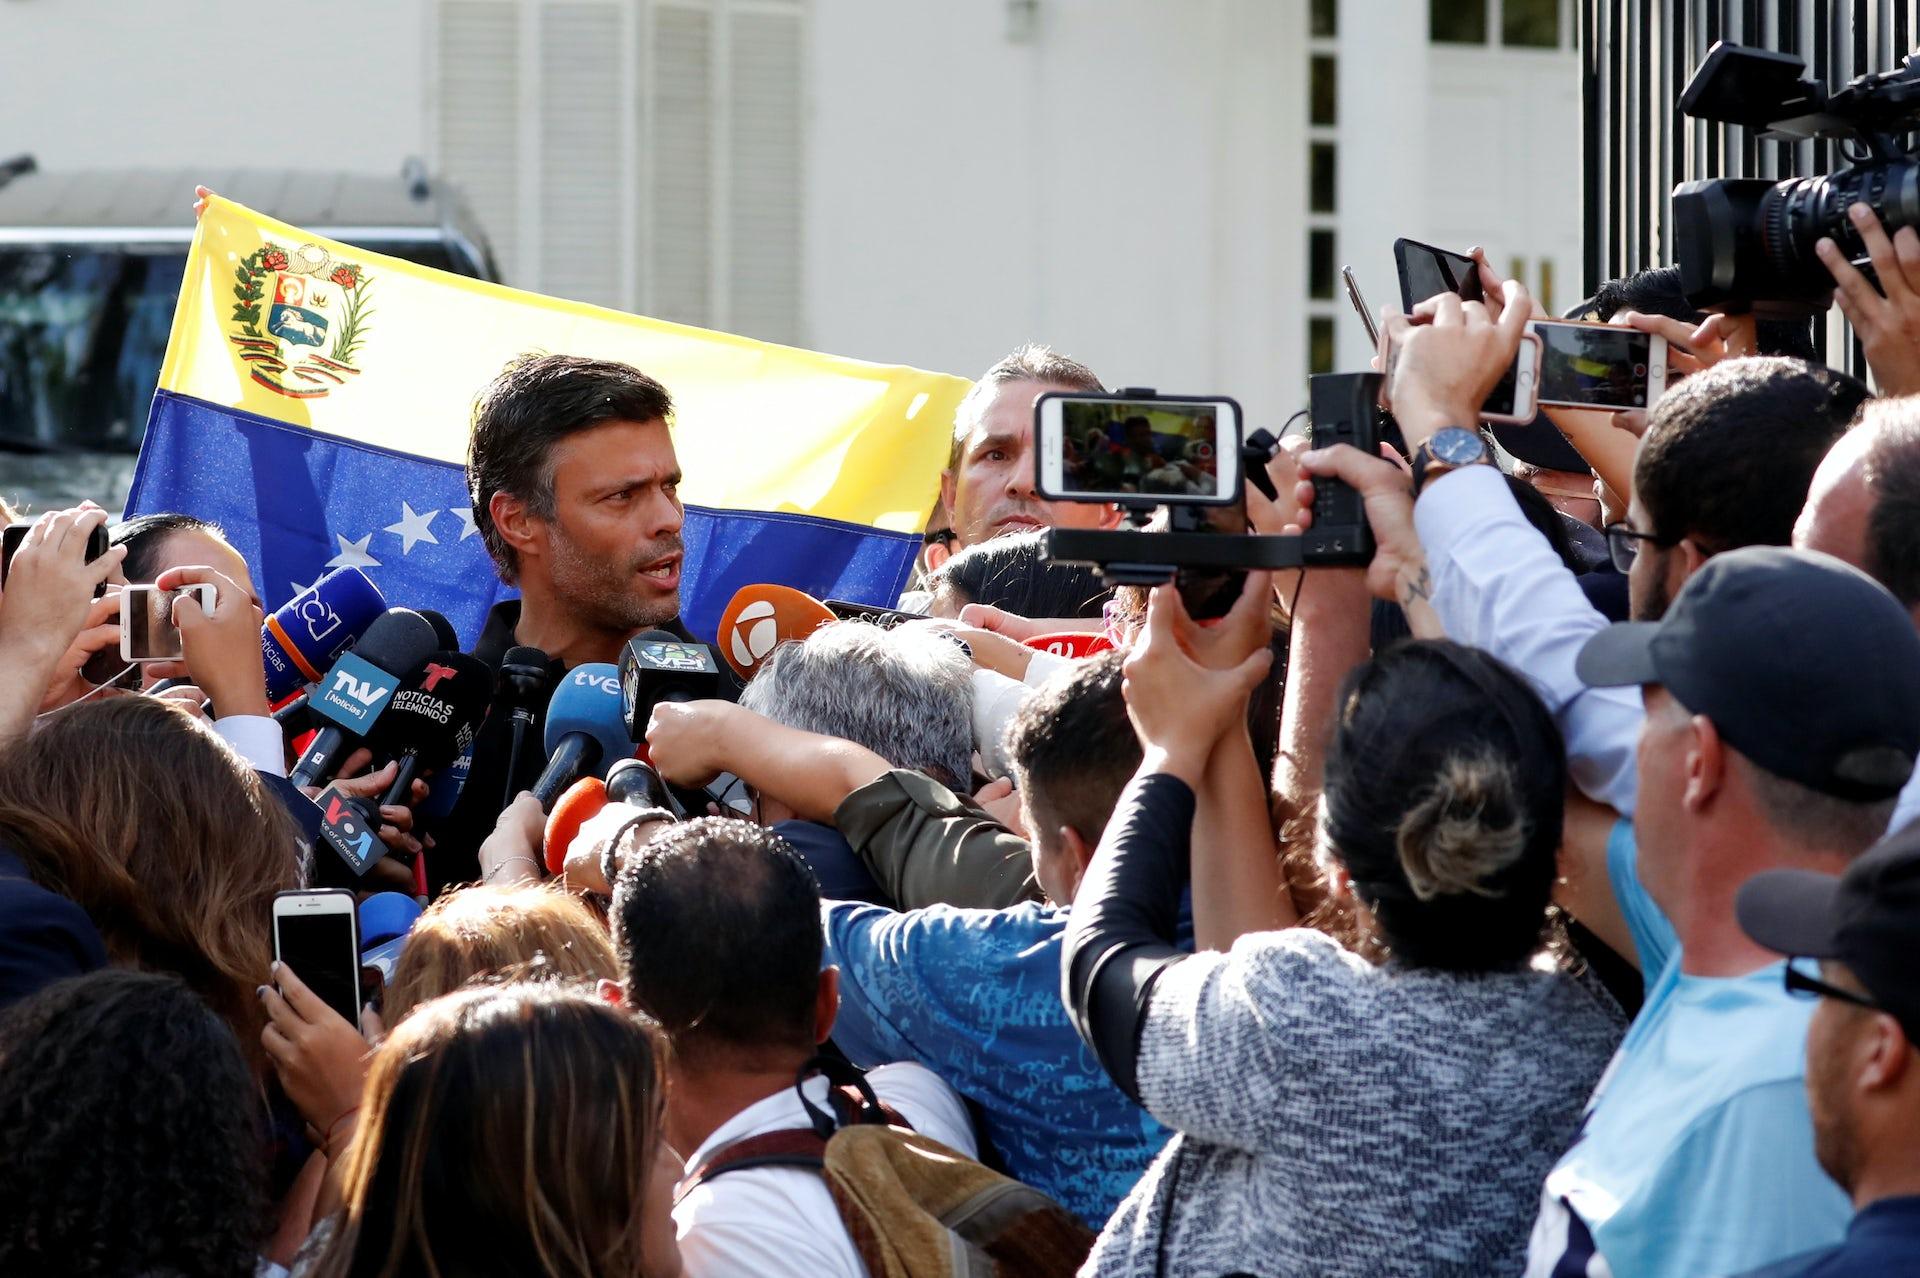 Venezuelan opposition leader Leopoldo López seeks refuge with Spain after failed uprising